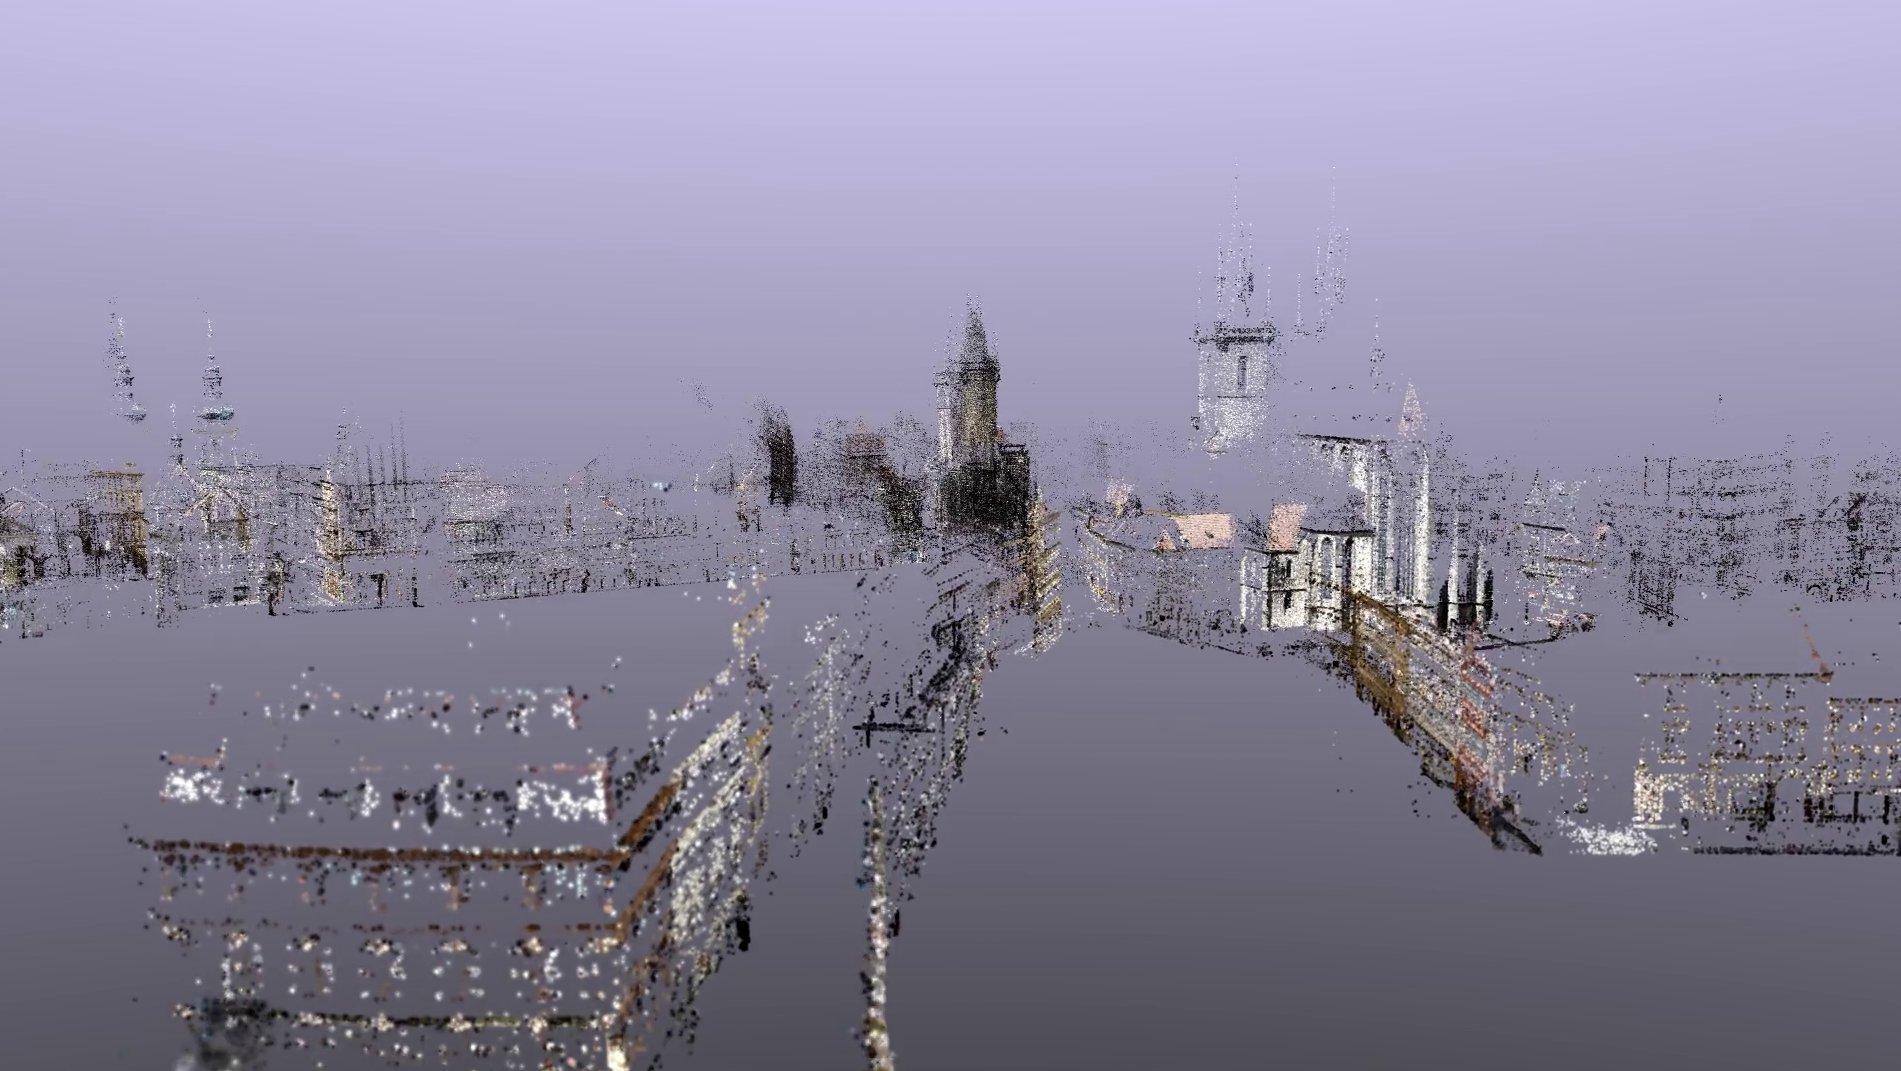 Cloud point rendering of the Prague dataset